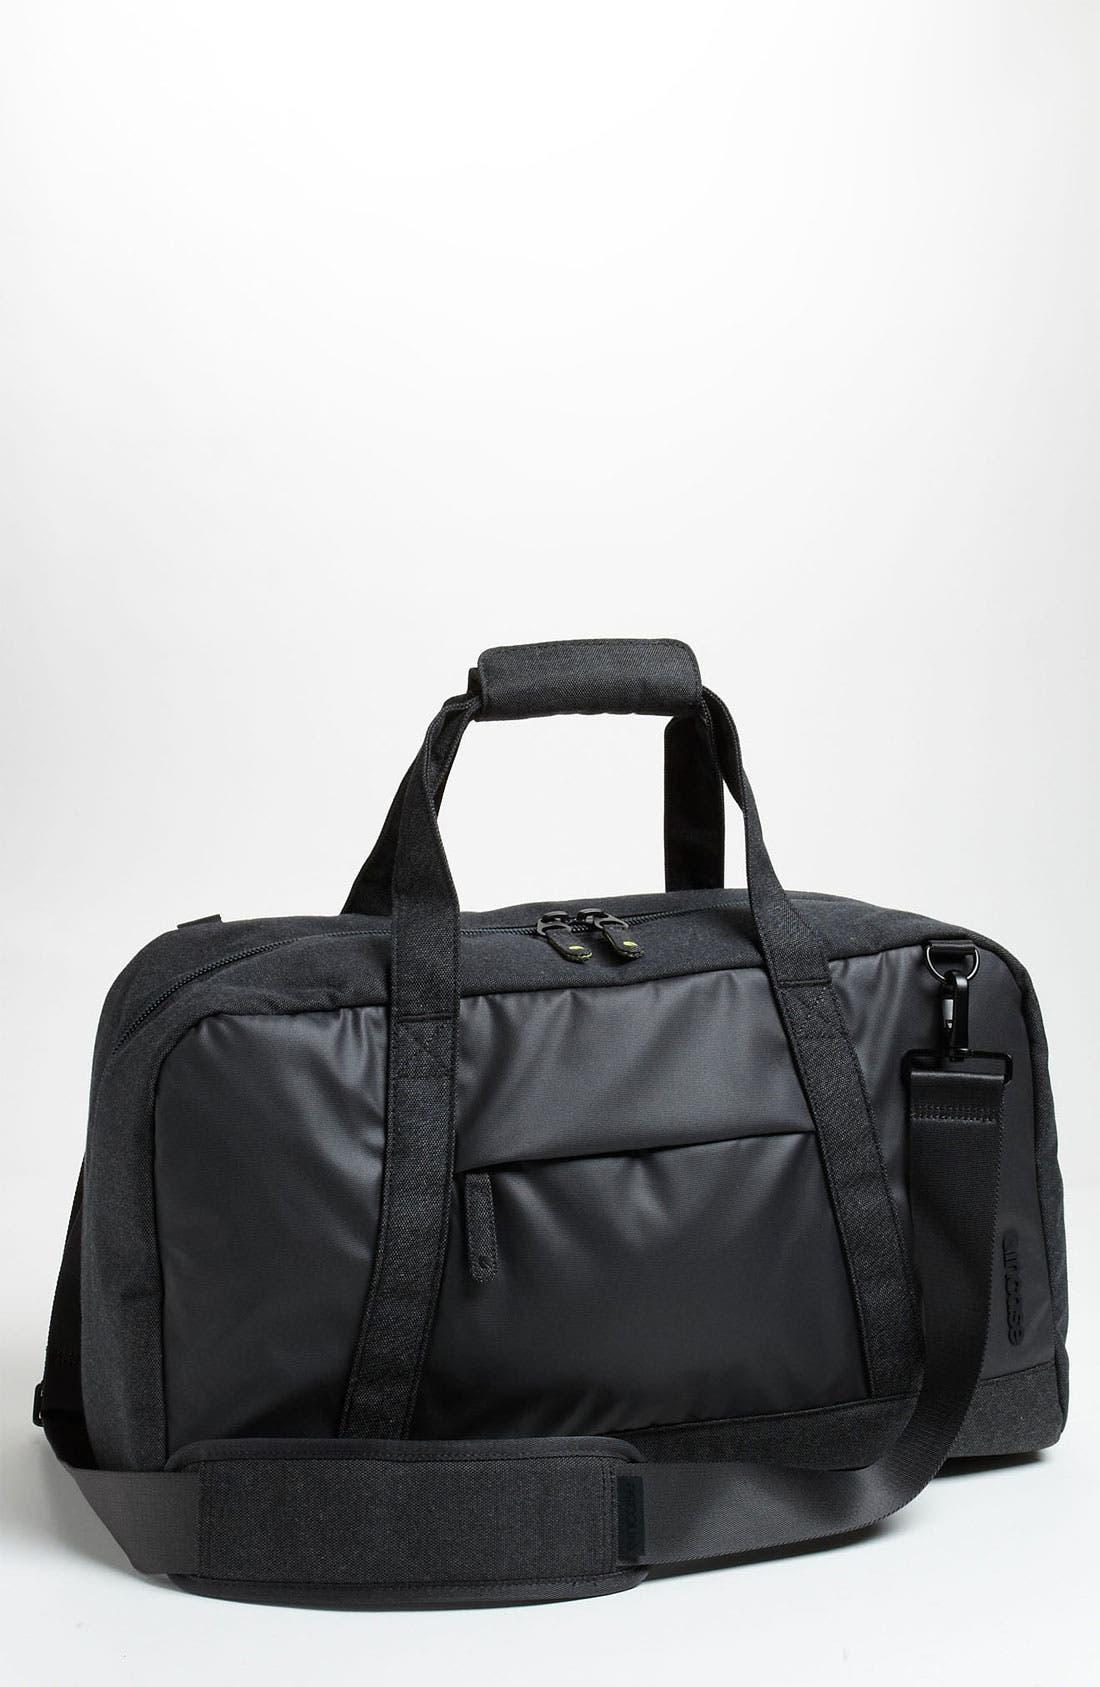 Incase 'EO' Travel Duffel Bag,                         Main,                         color, 001